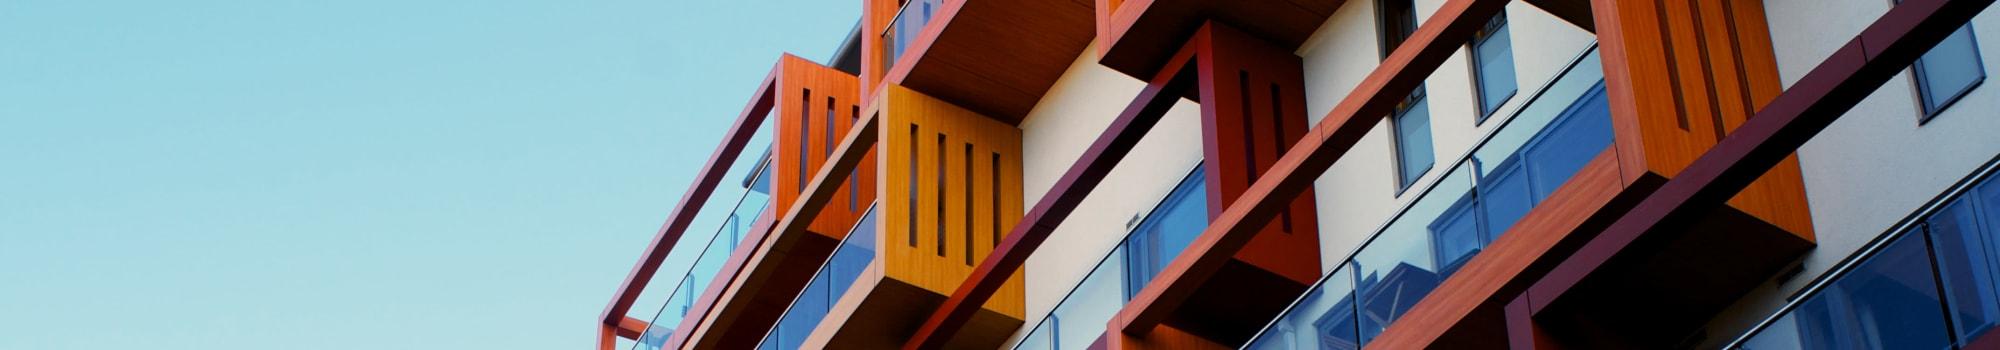 Maintenance Request of Canterbury Apartments in Bridgeville, Delaware